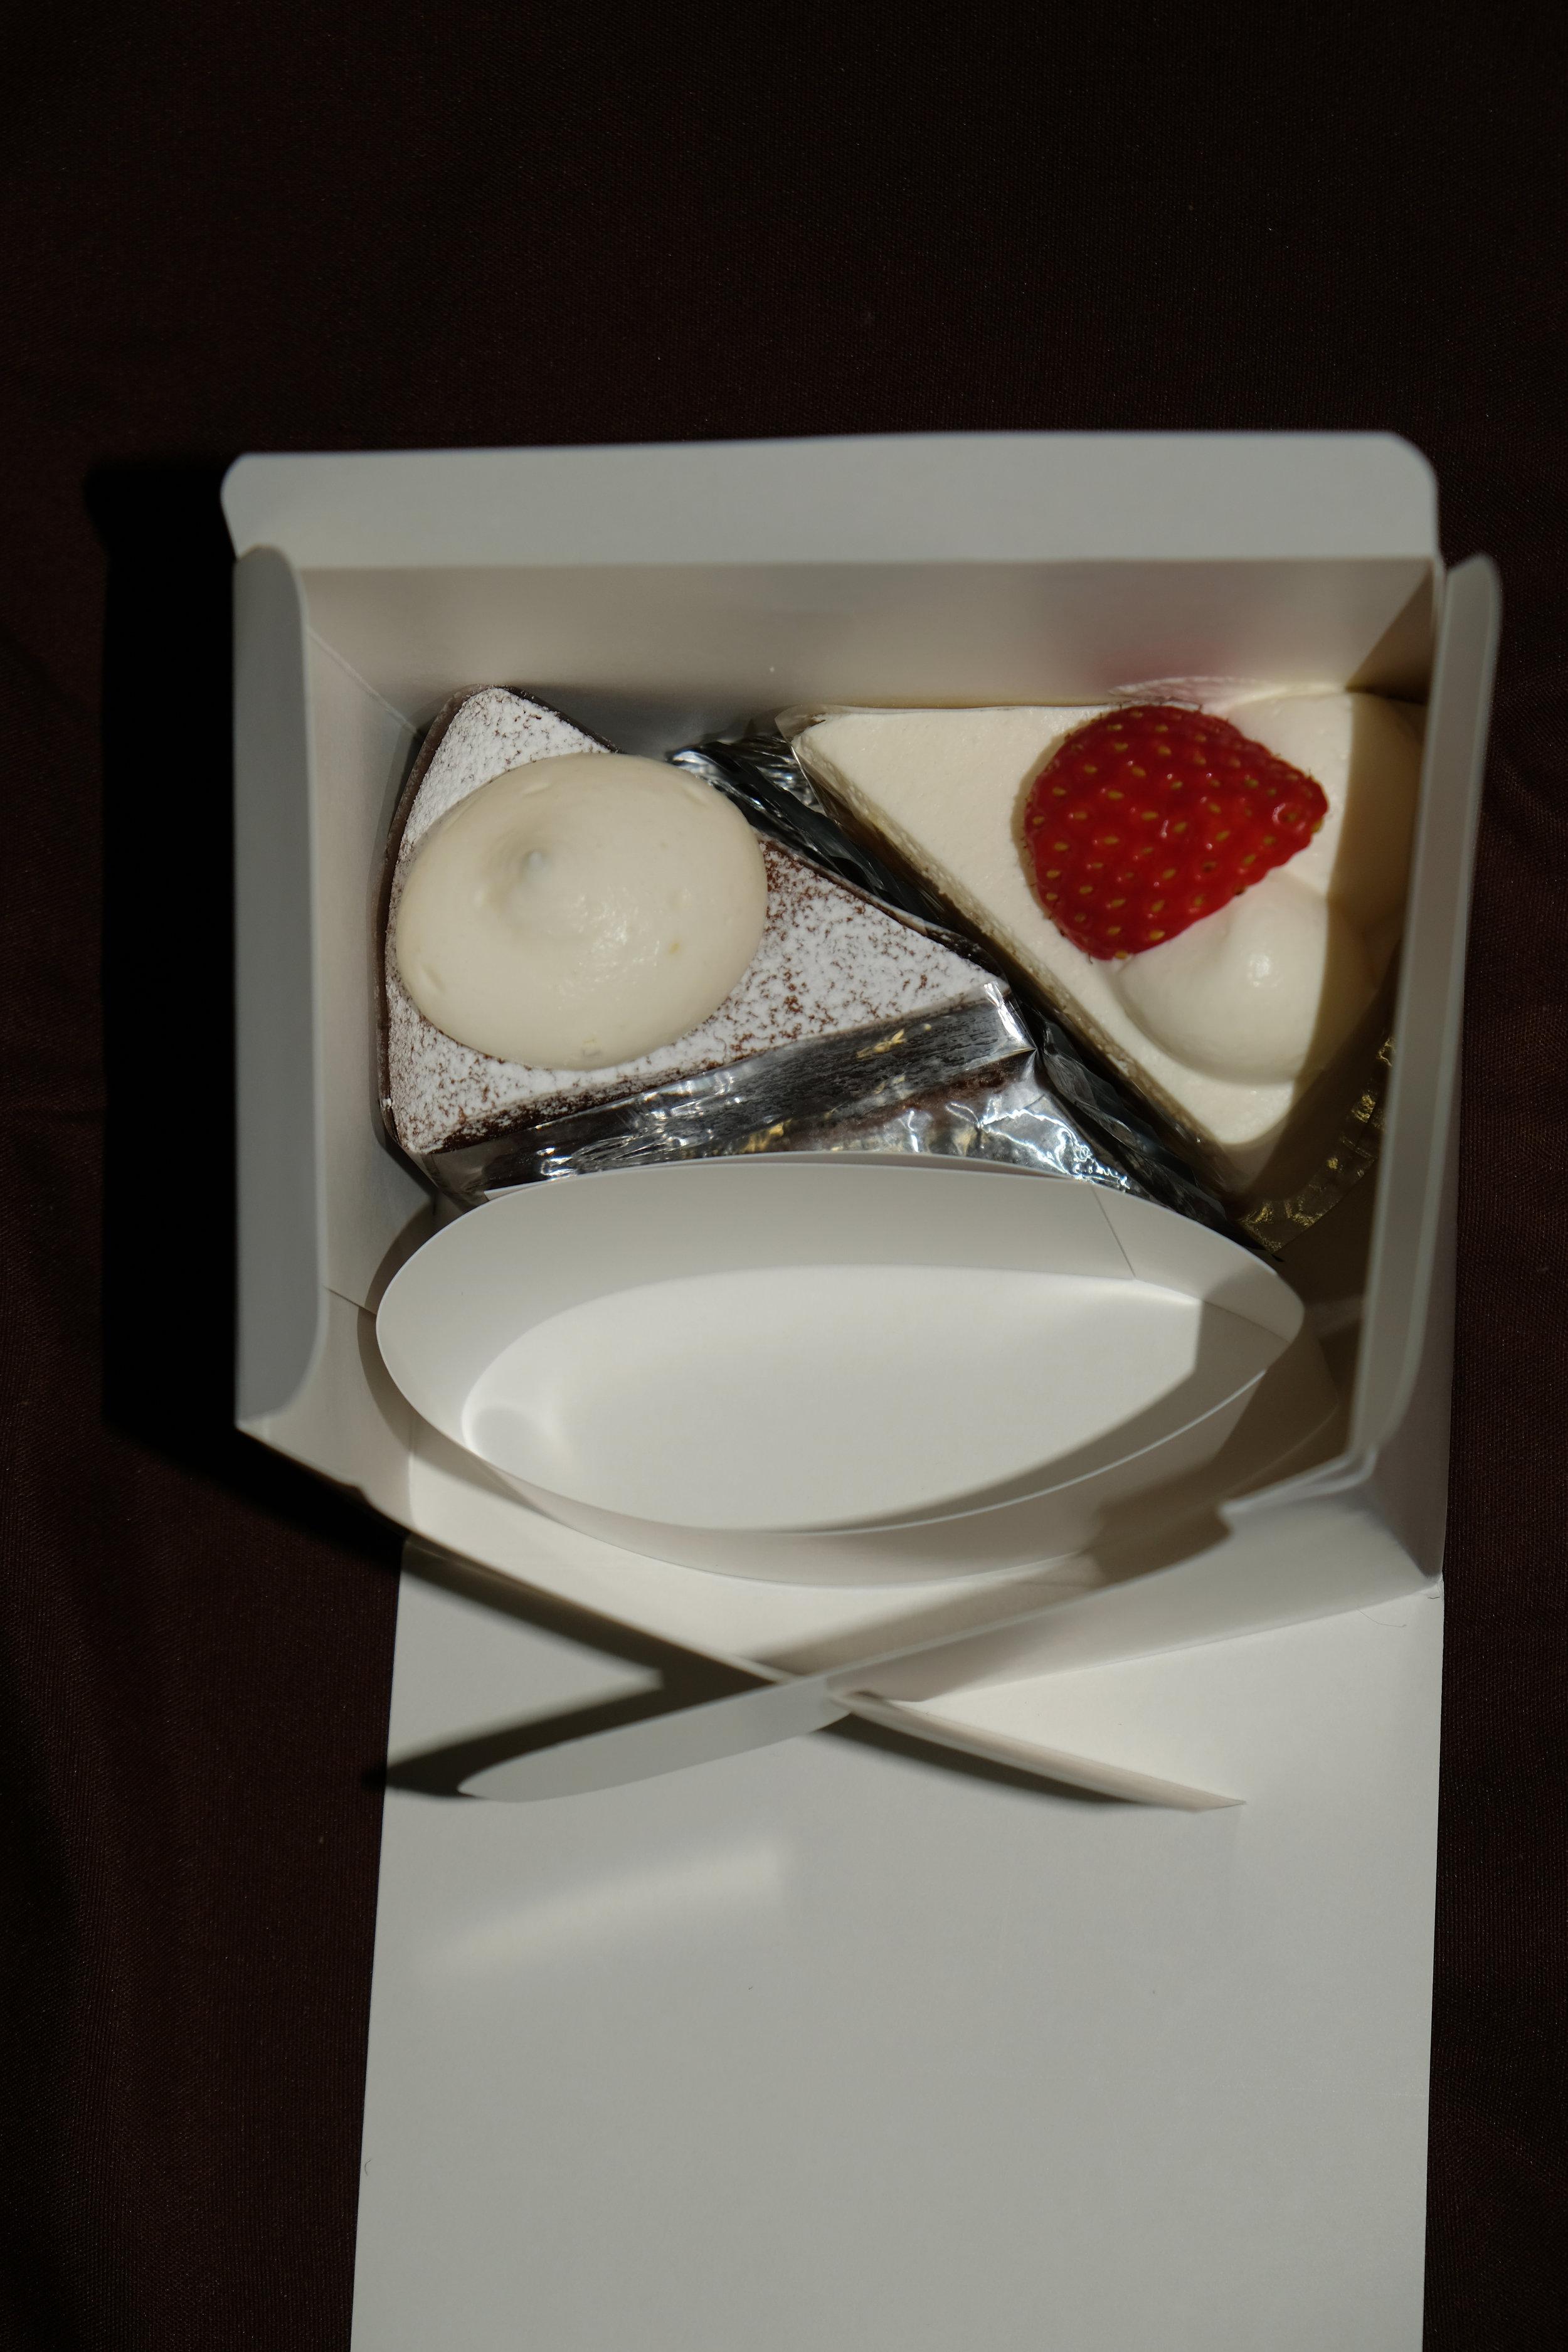 Chocolate & Strawberry Cake, 2018